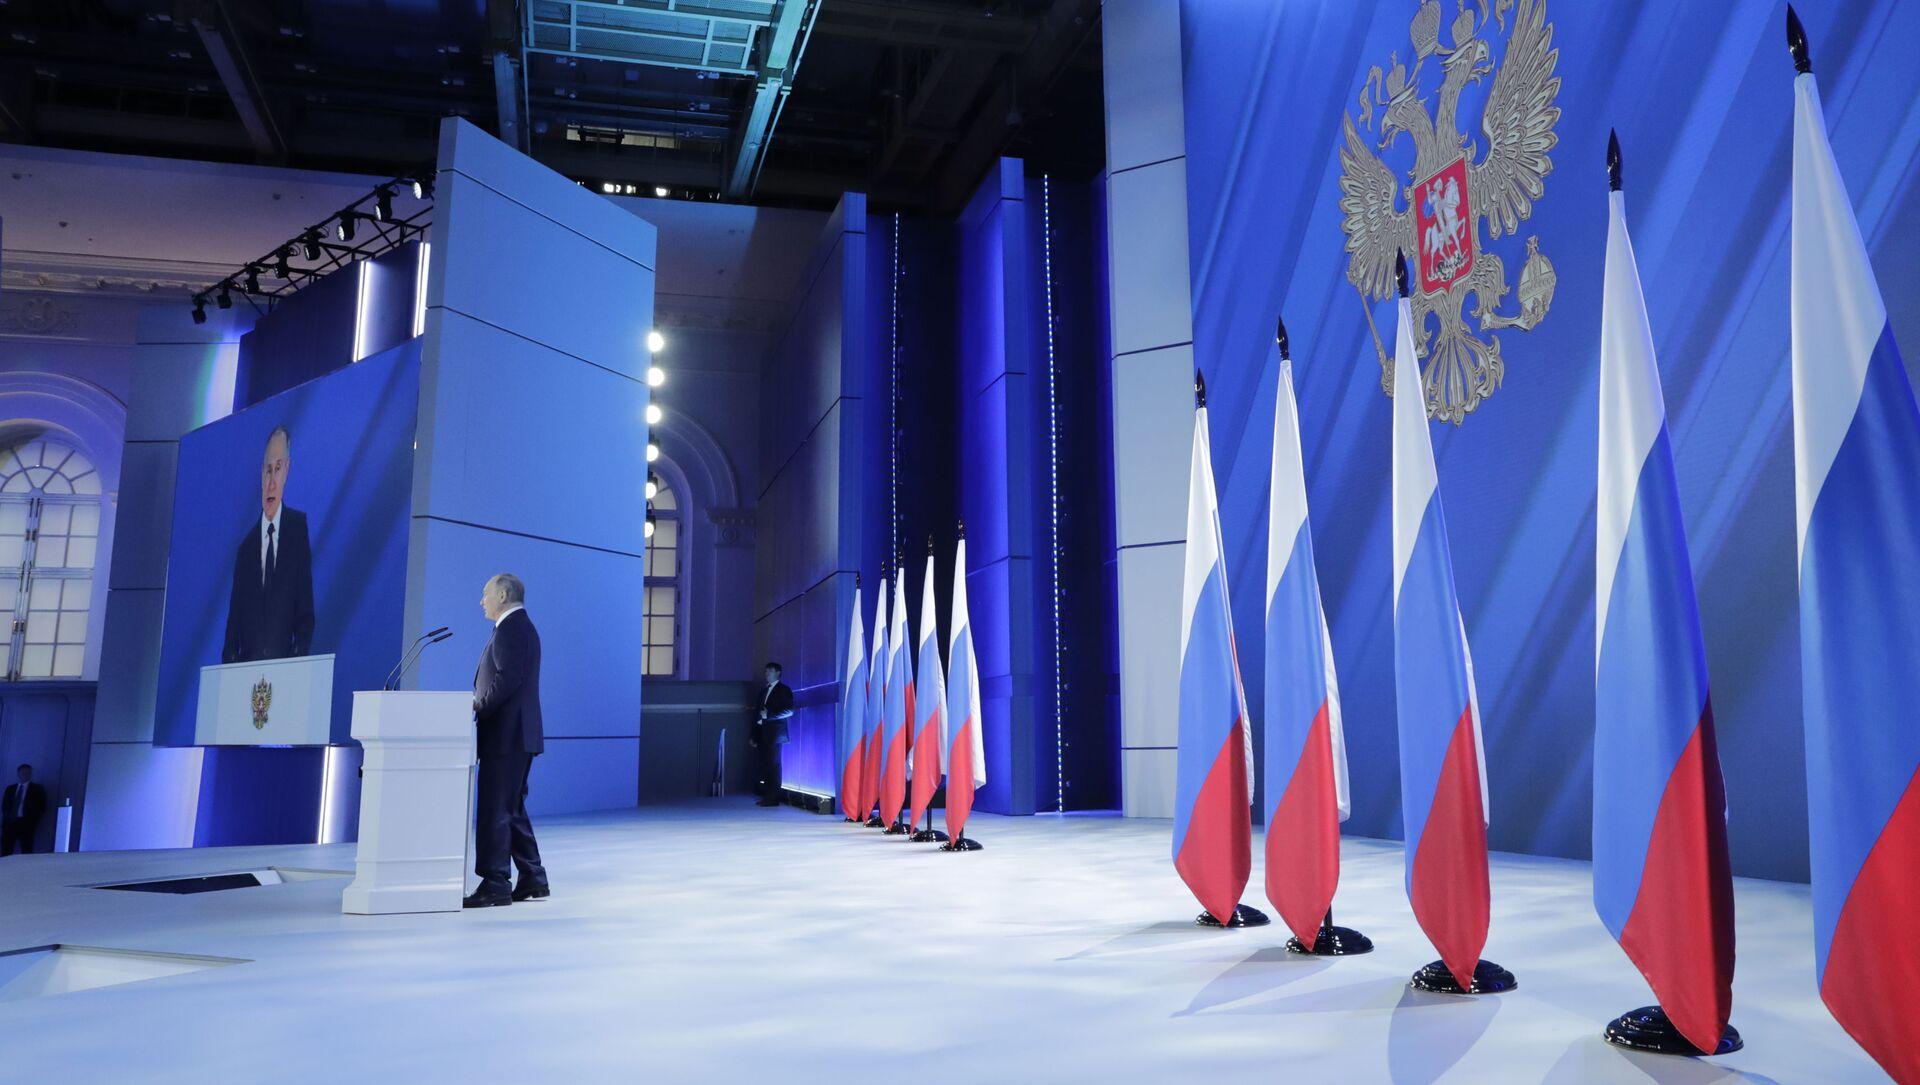 Il discorso di Vladimir Putin all'Assemblea federale - Sputnik Italia, 1920, 23.04.2021